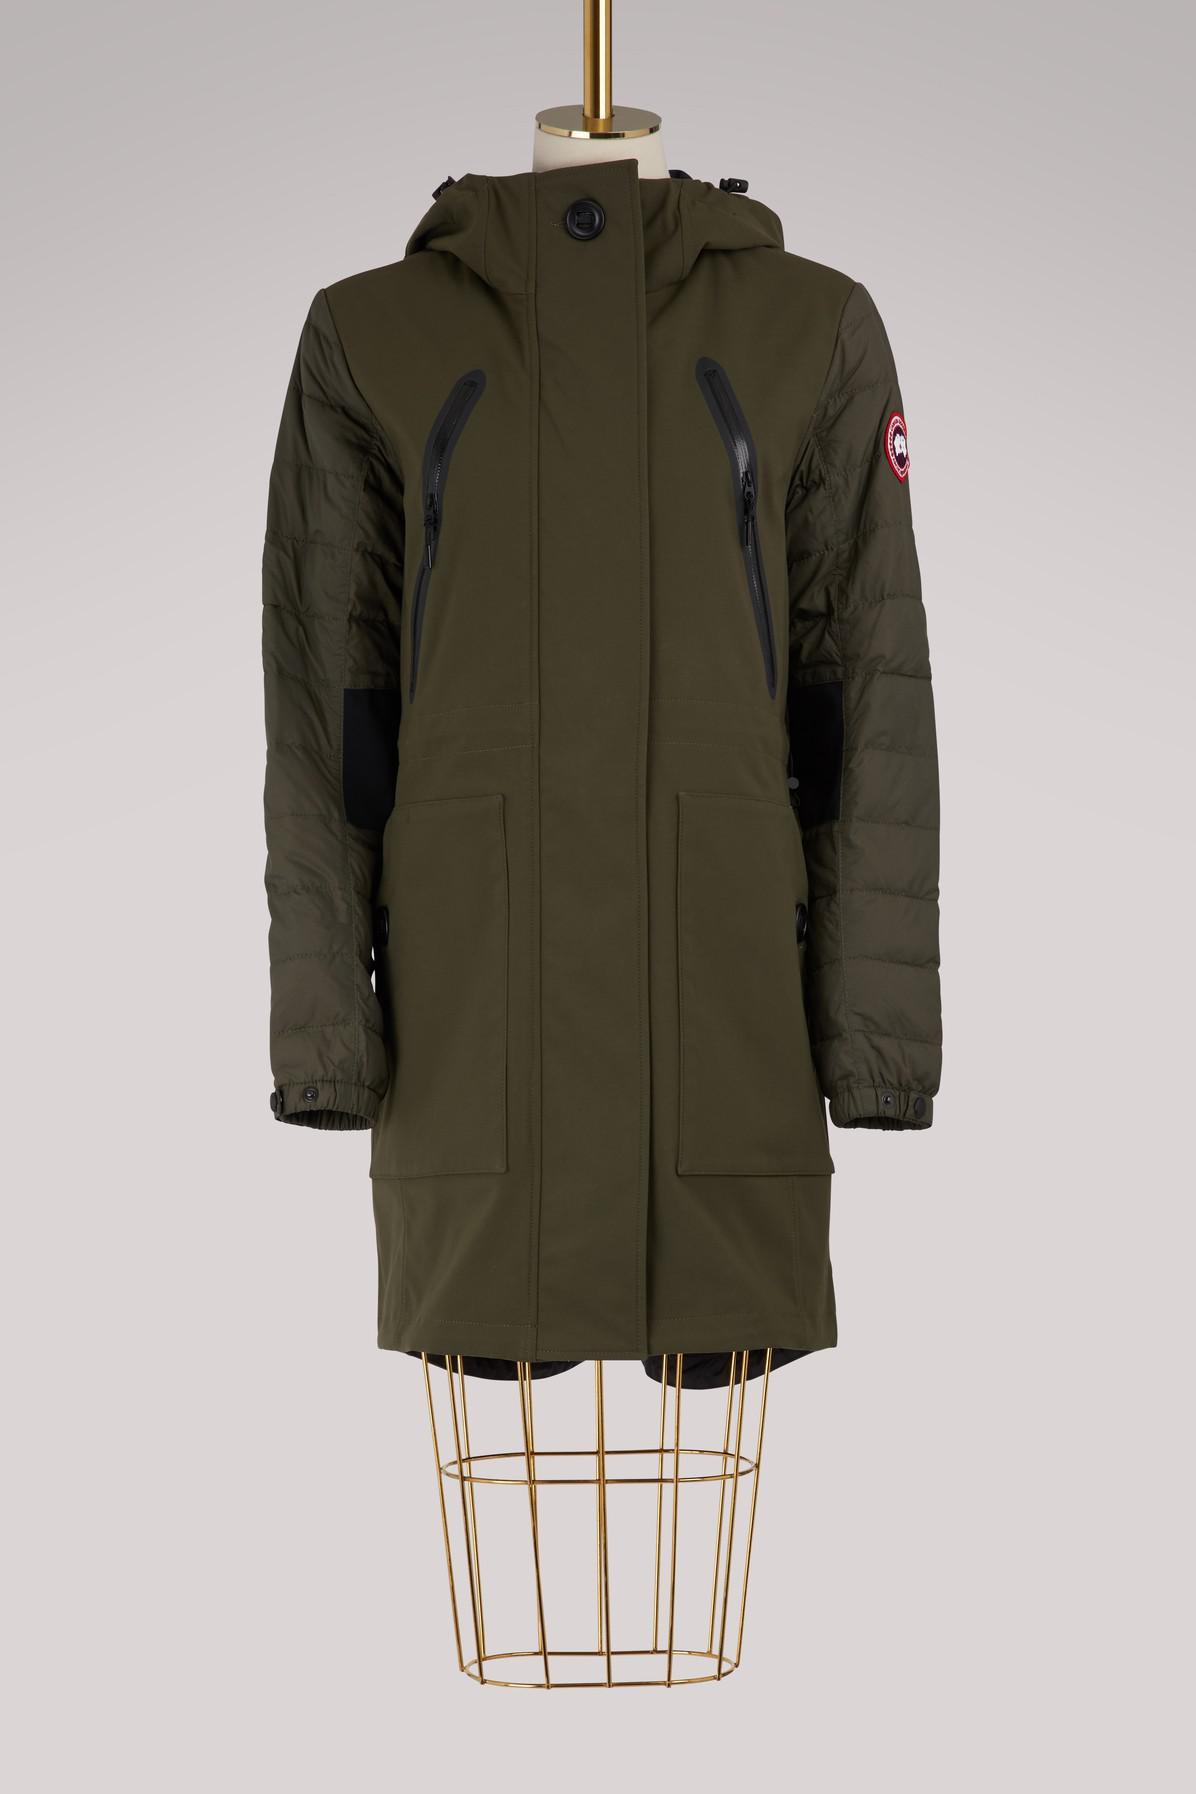 Canada Goose. Women's Green Sabine Coat